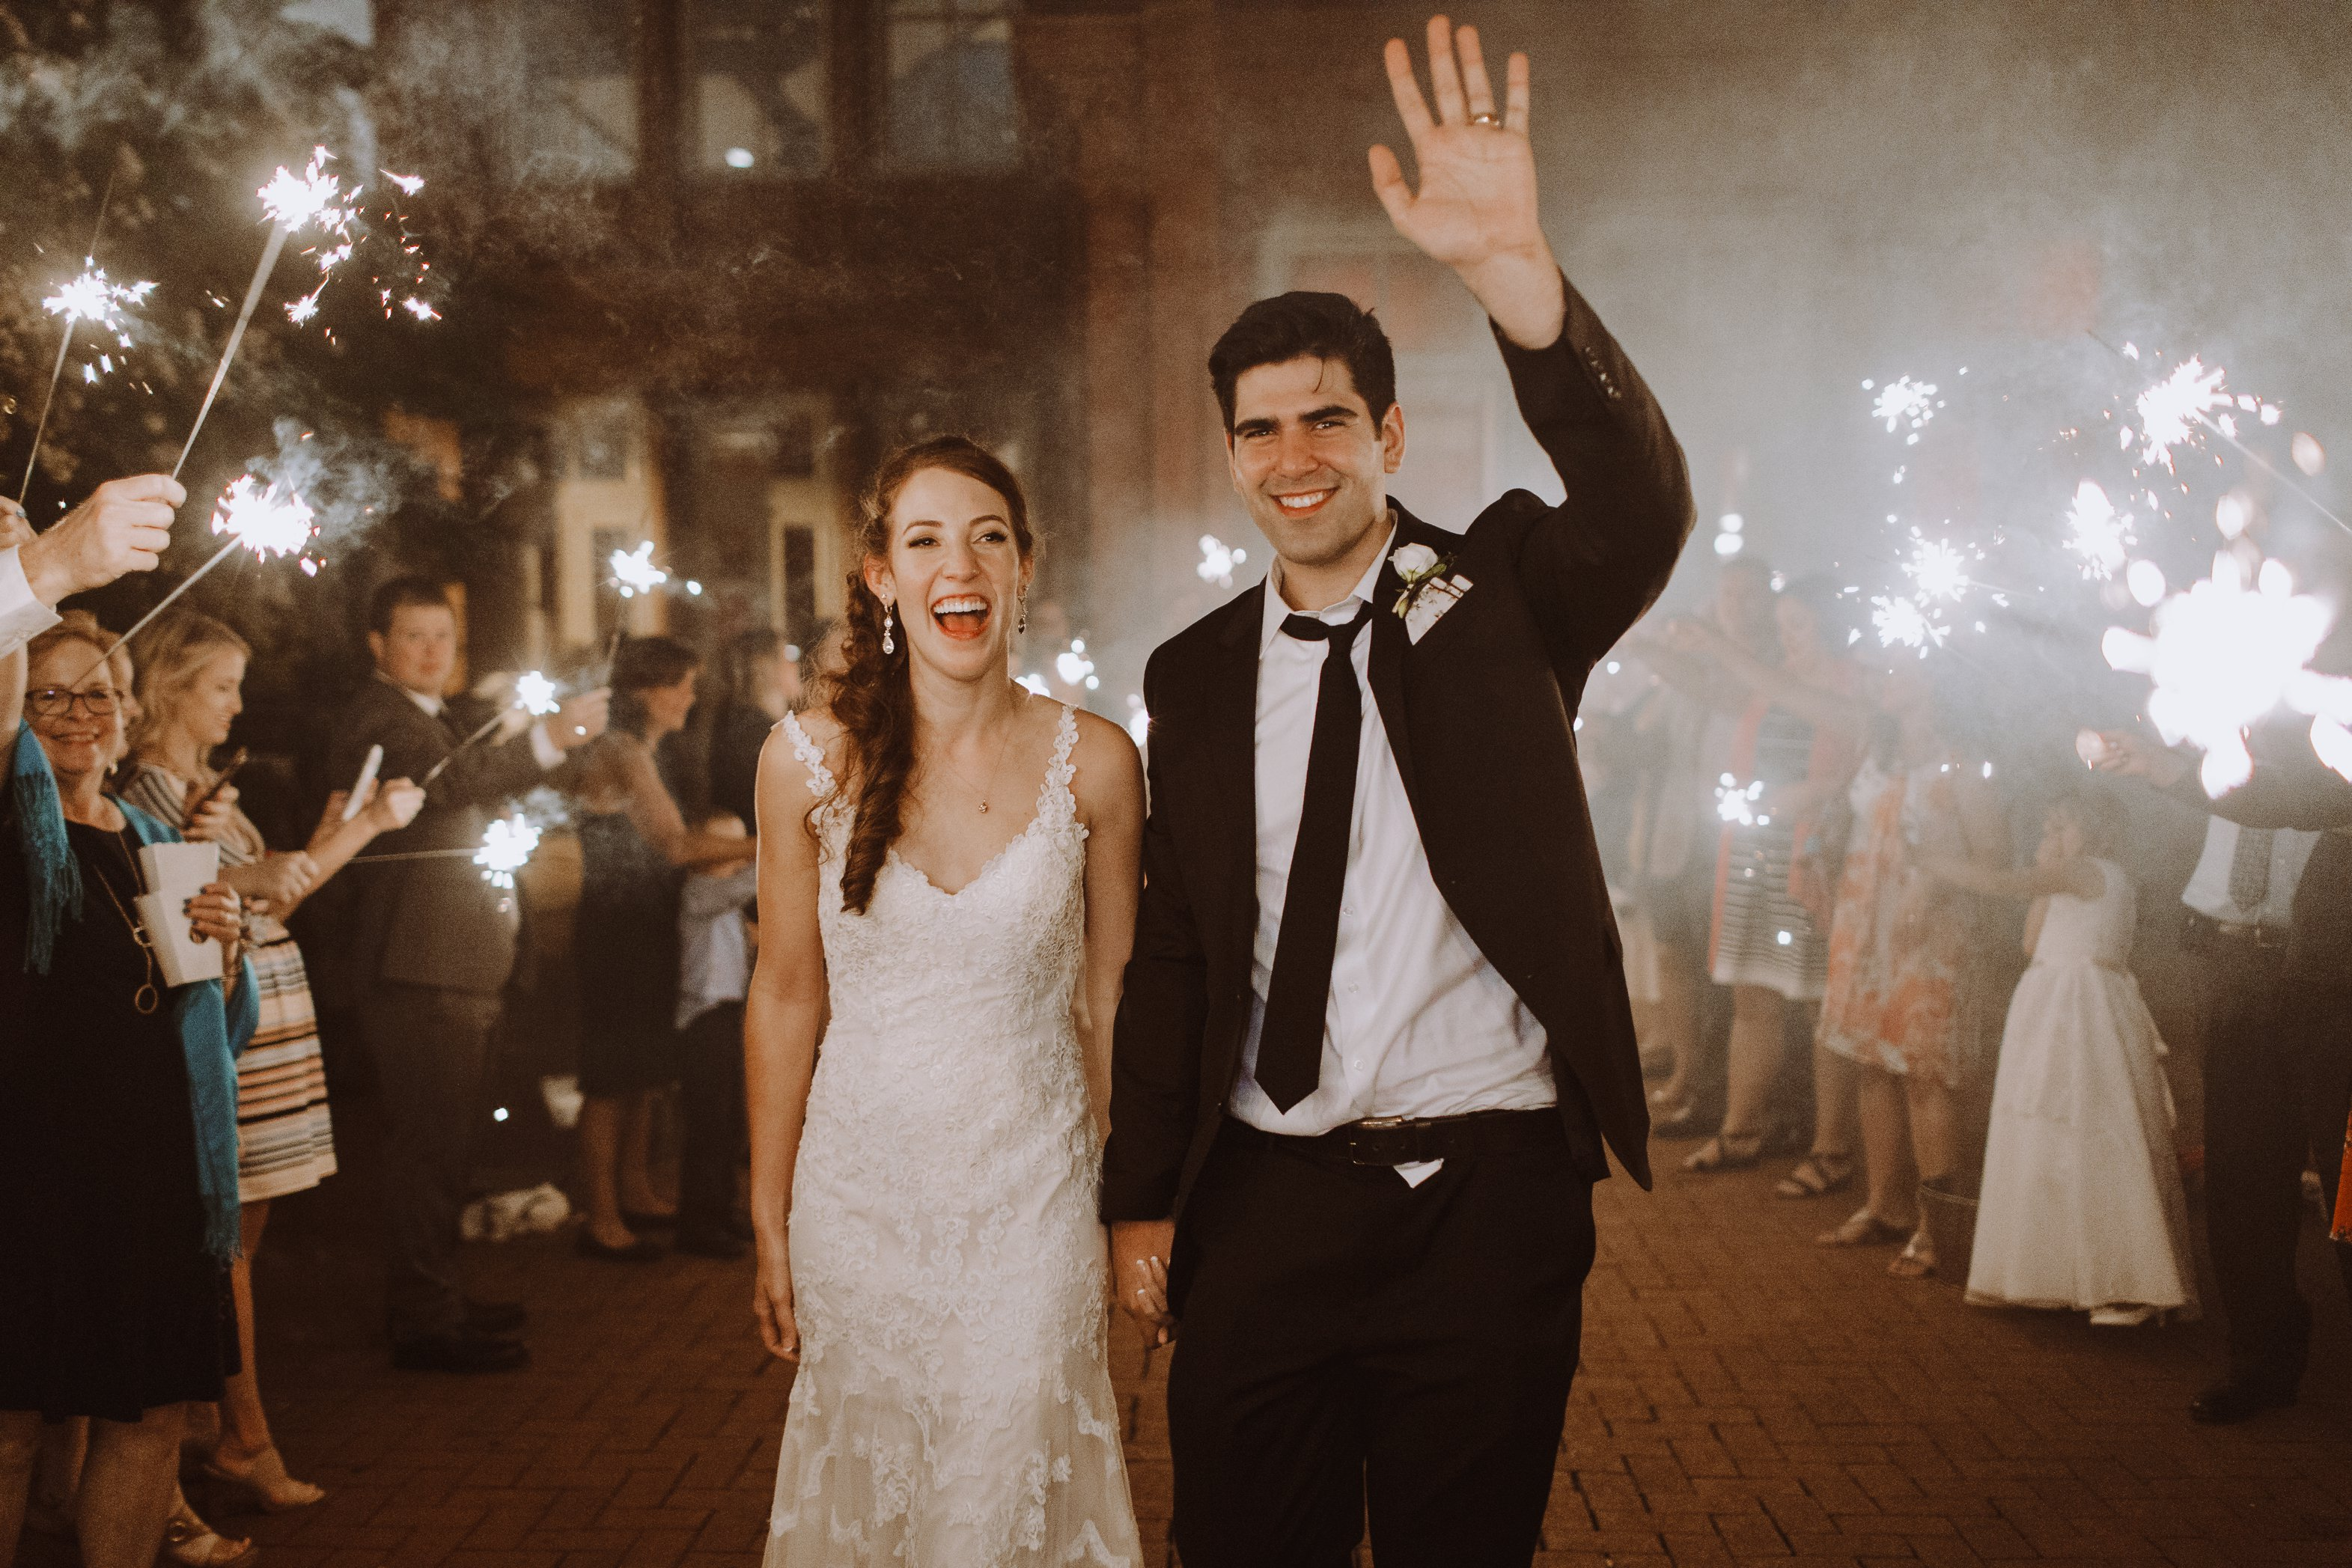 1840s Ballroom wedding bride and groom sparkler exit Baltimore Maryland wedding photographer